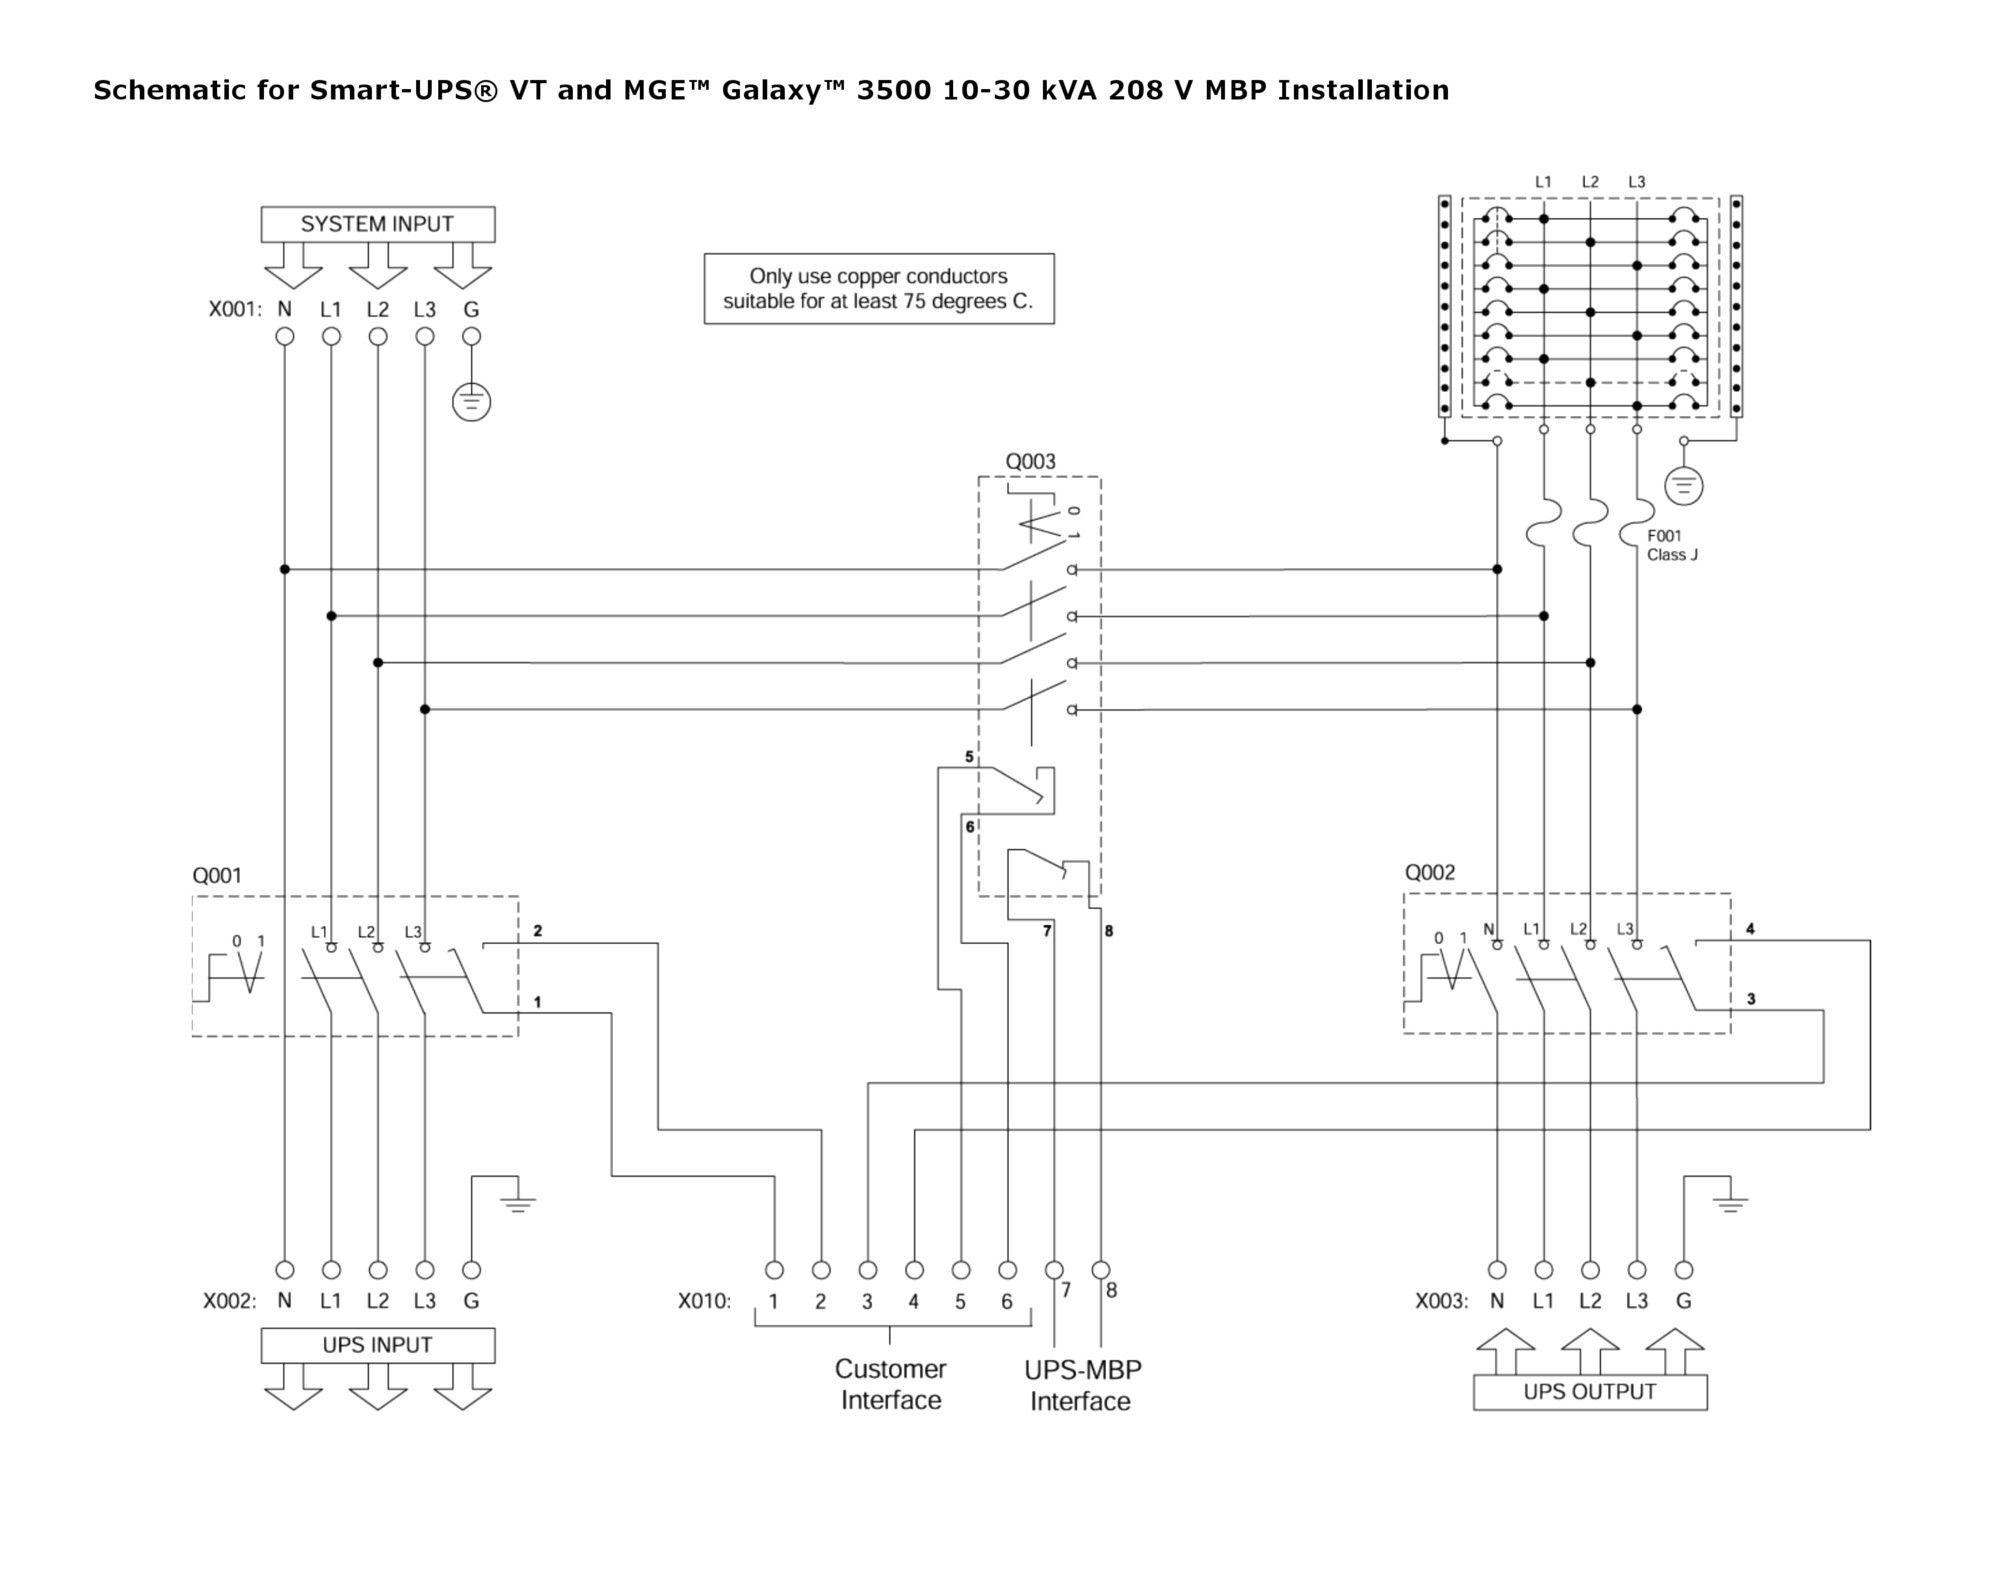 Best Of Wiring Diagram Under Cabinet Lighting Diagrams Digramssample Diagramimages Wiringdiagramsample Wir Lighting Diagram Diagram Under Cabinet Lighting